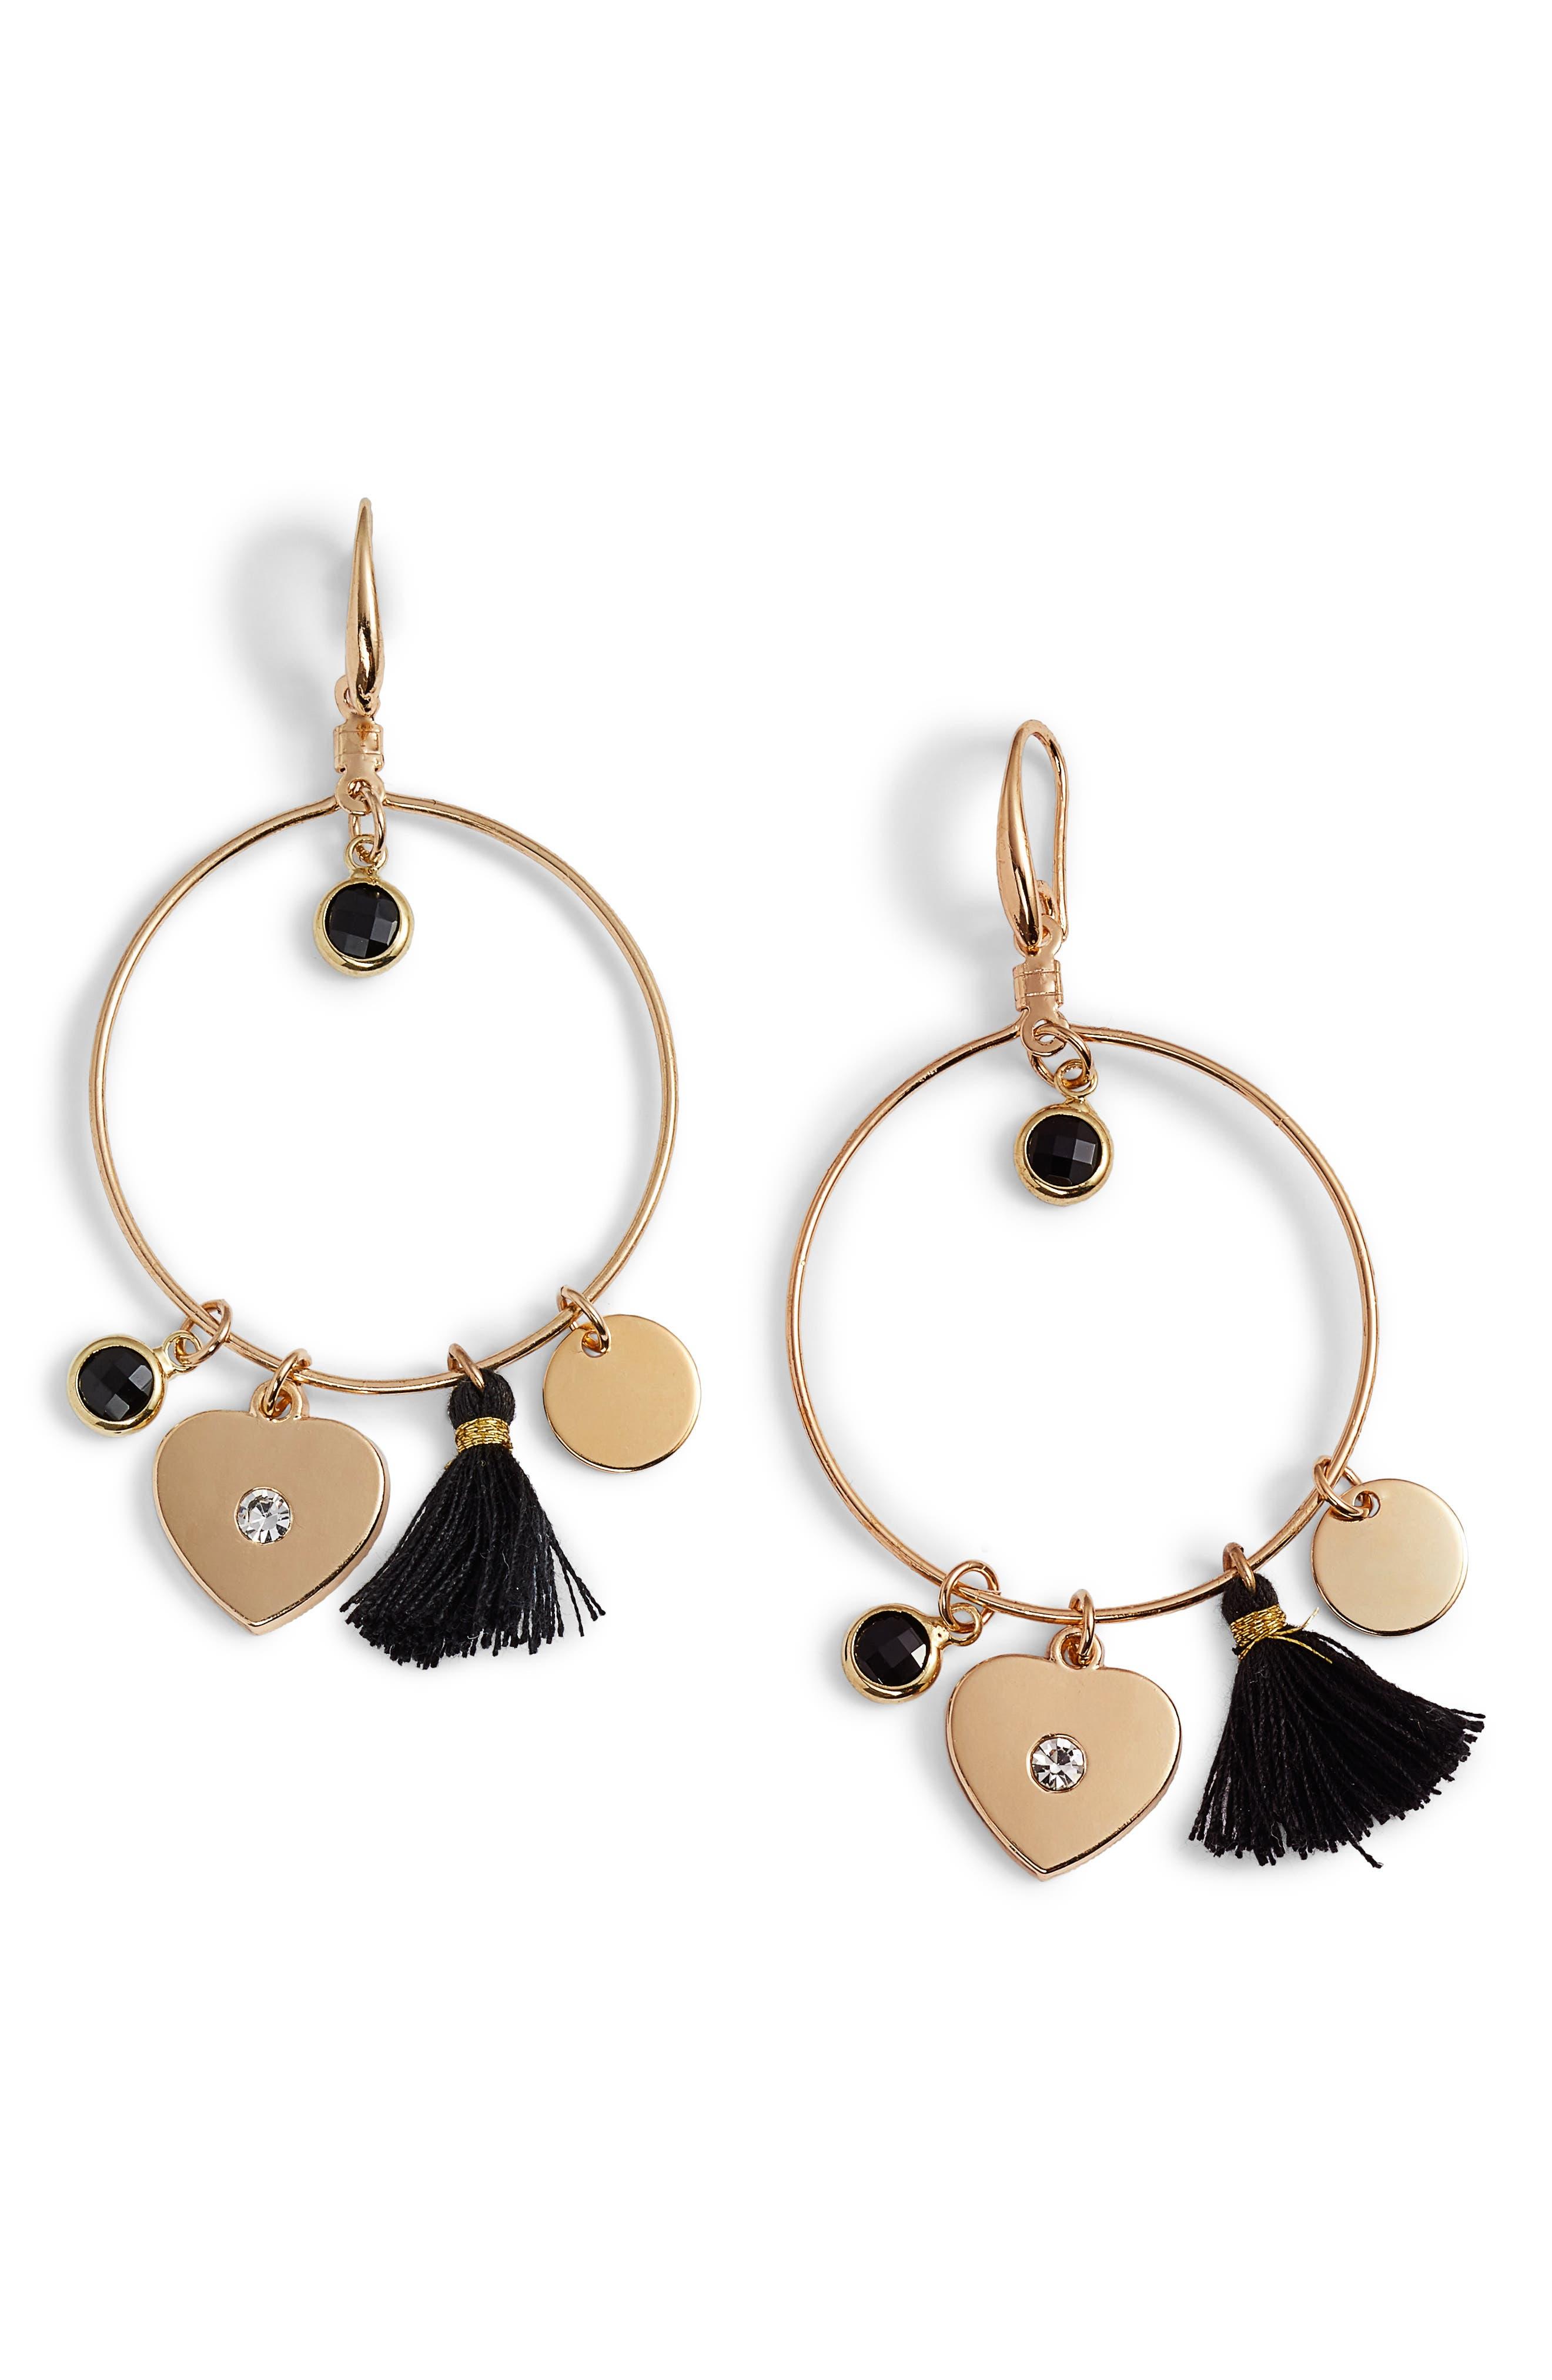 Samantha Tassel & Charm Hoop Earrings,                         Main,                         color, Gold